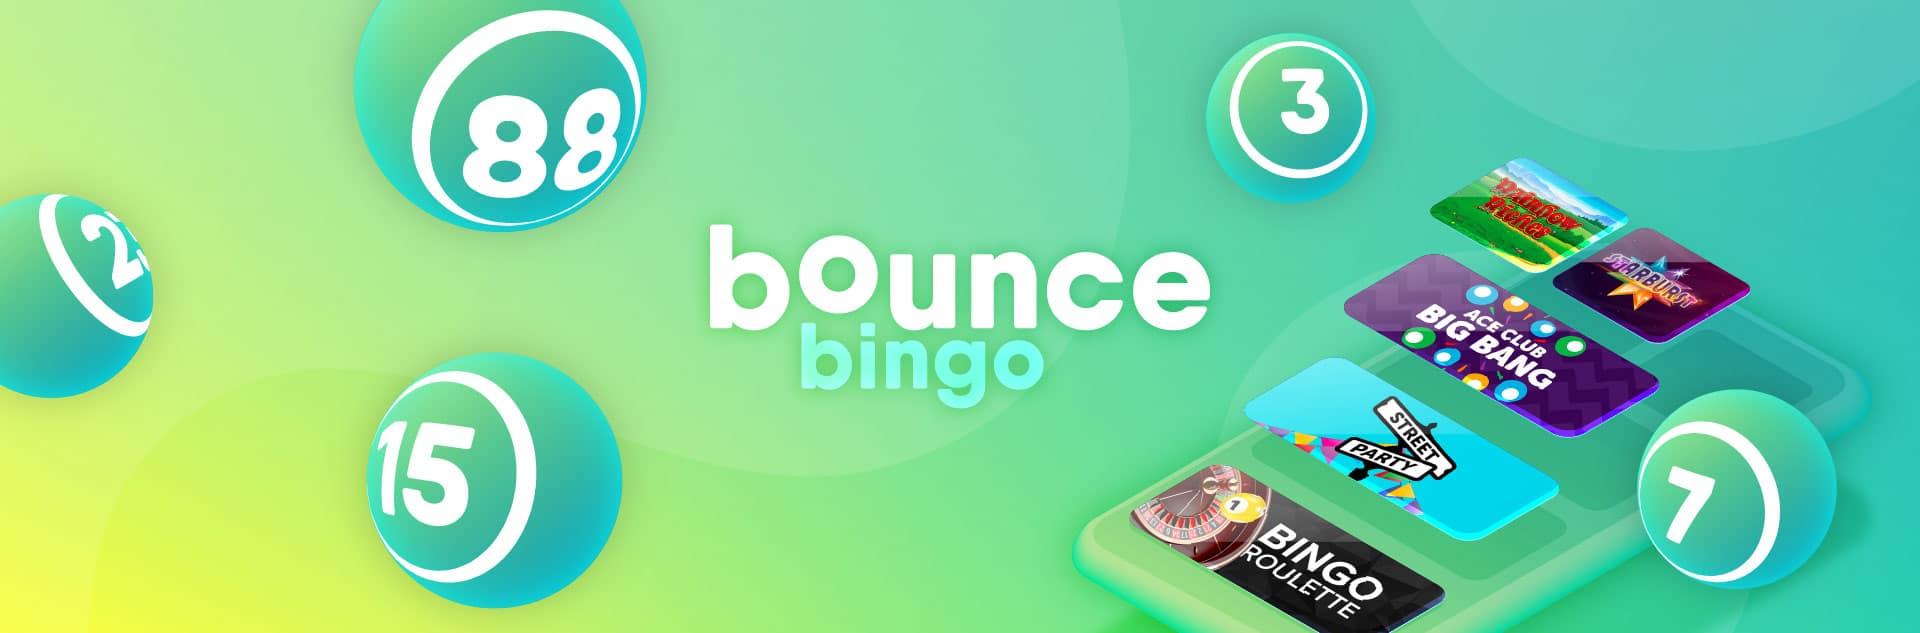 Bounce Bingo Review image